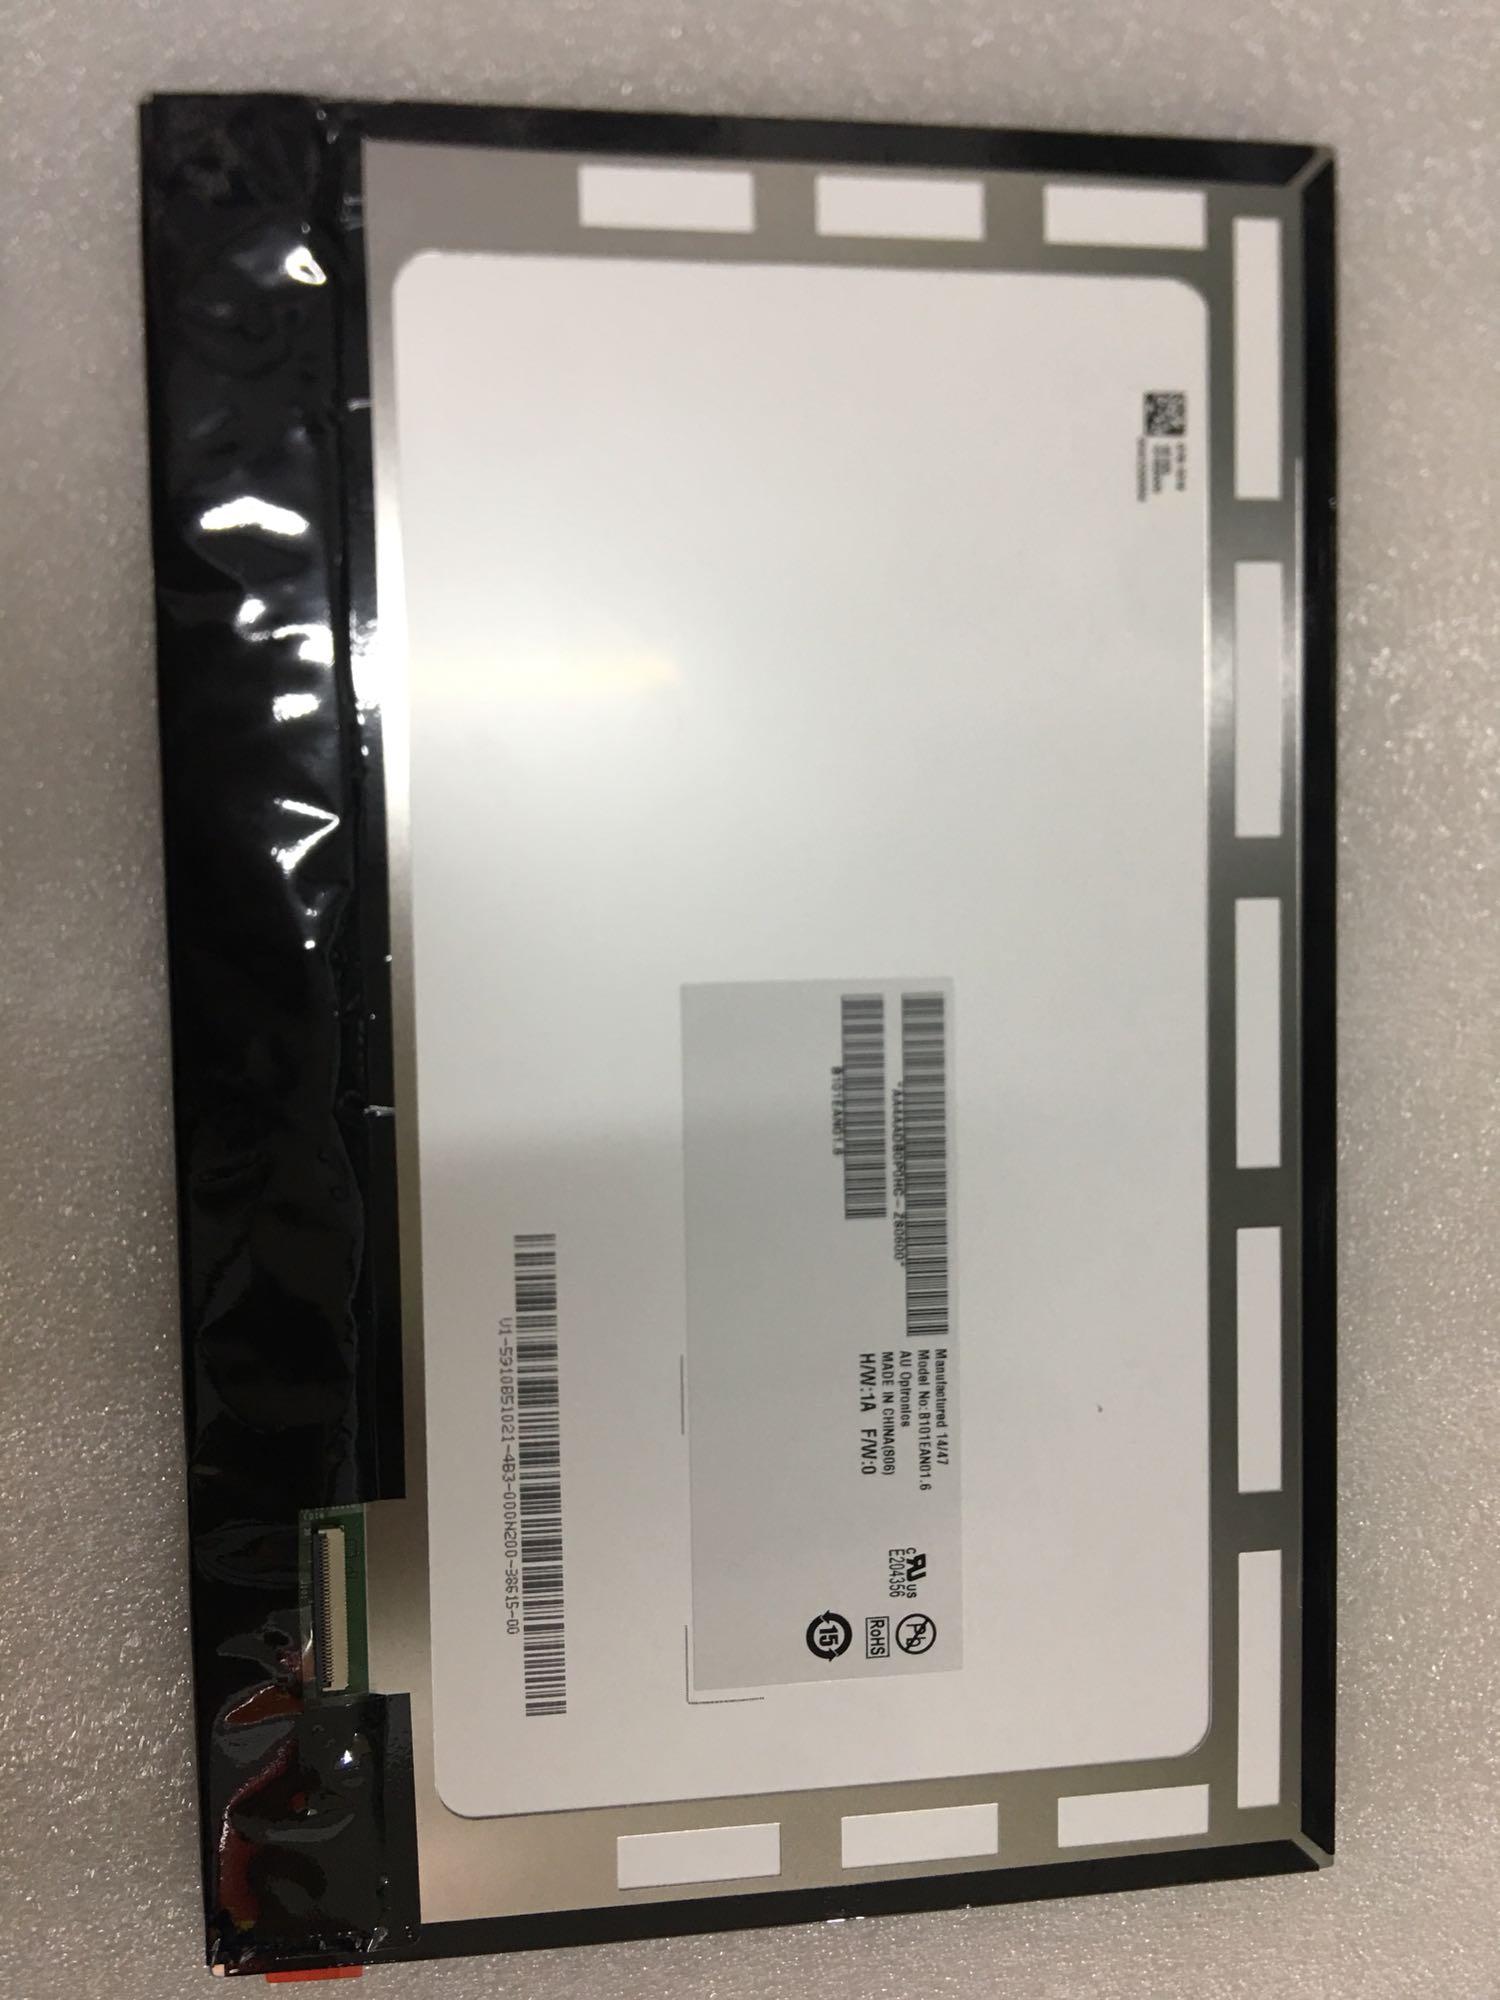 B101EAN01.6 1280x800 LCD Screen Digitizer for ASUS Transformer Pad TF103 ME103 K010 ME103C ME103K ME102 K018 Free ShippingB101EAN01.6 1280x800 LCD Screen Digitizer for ASUS Transformer Pad TF103 ME103 K010 ME103C ME103K ME102 K018 Free Shipping